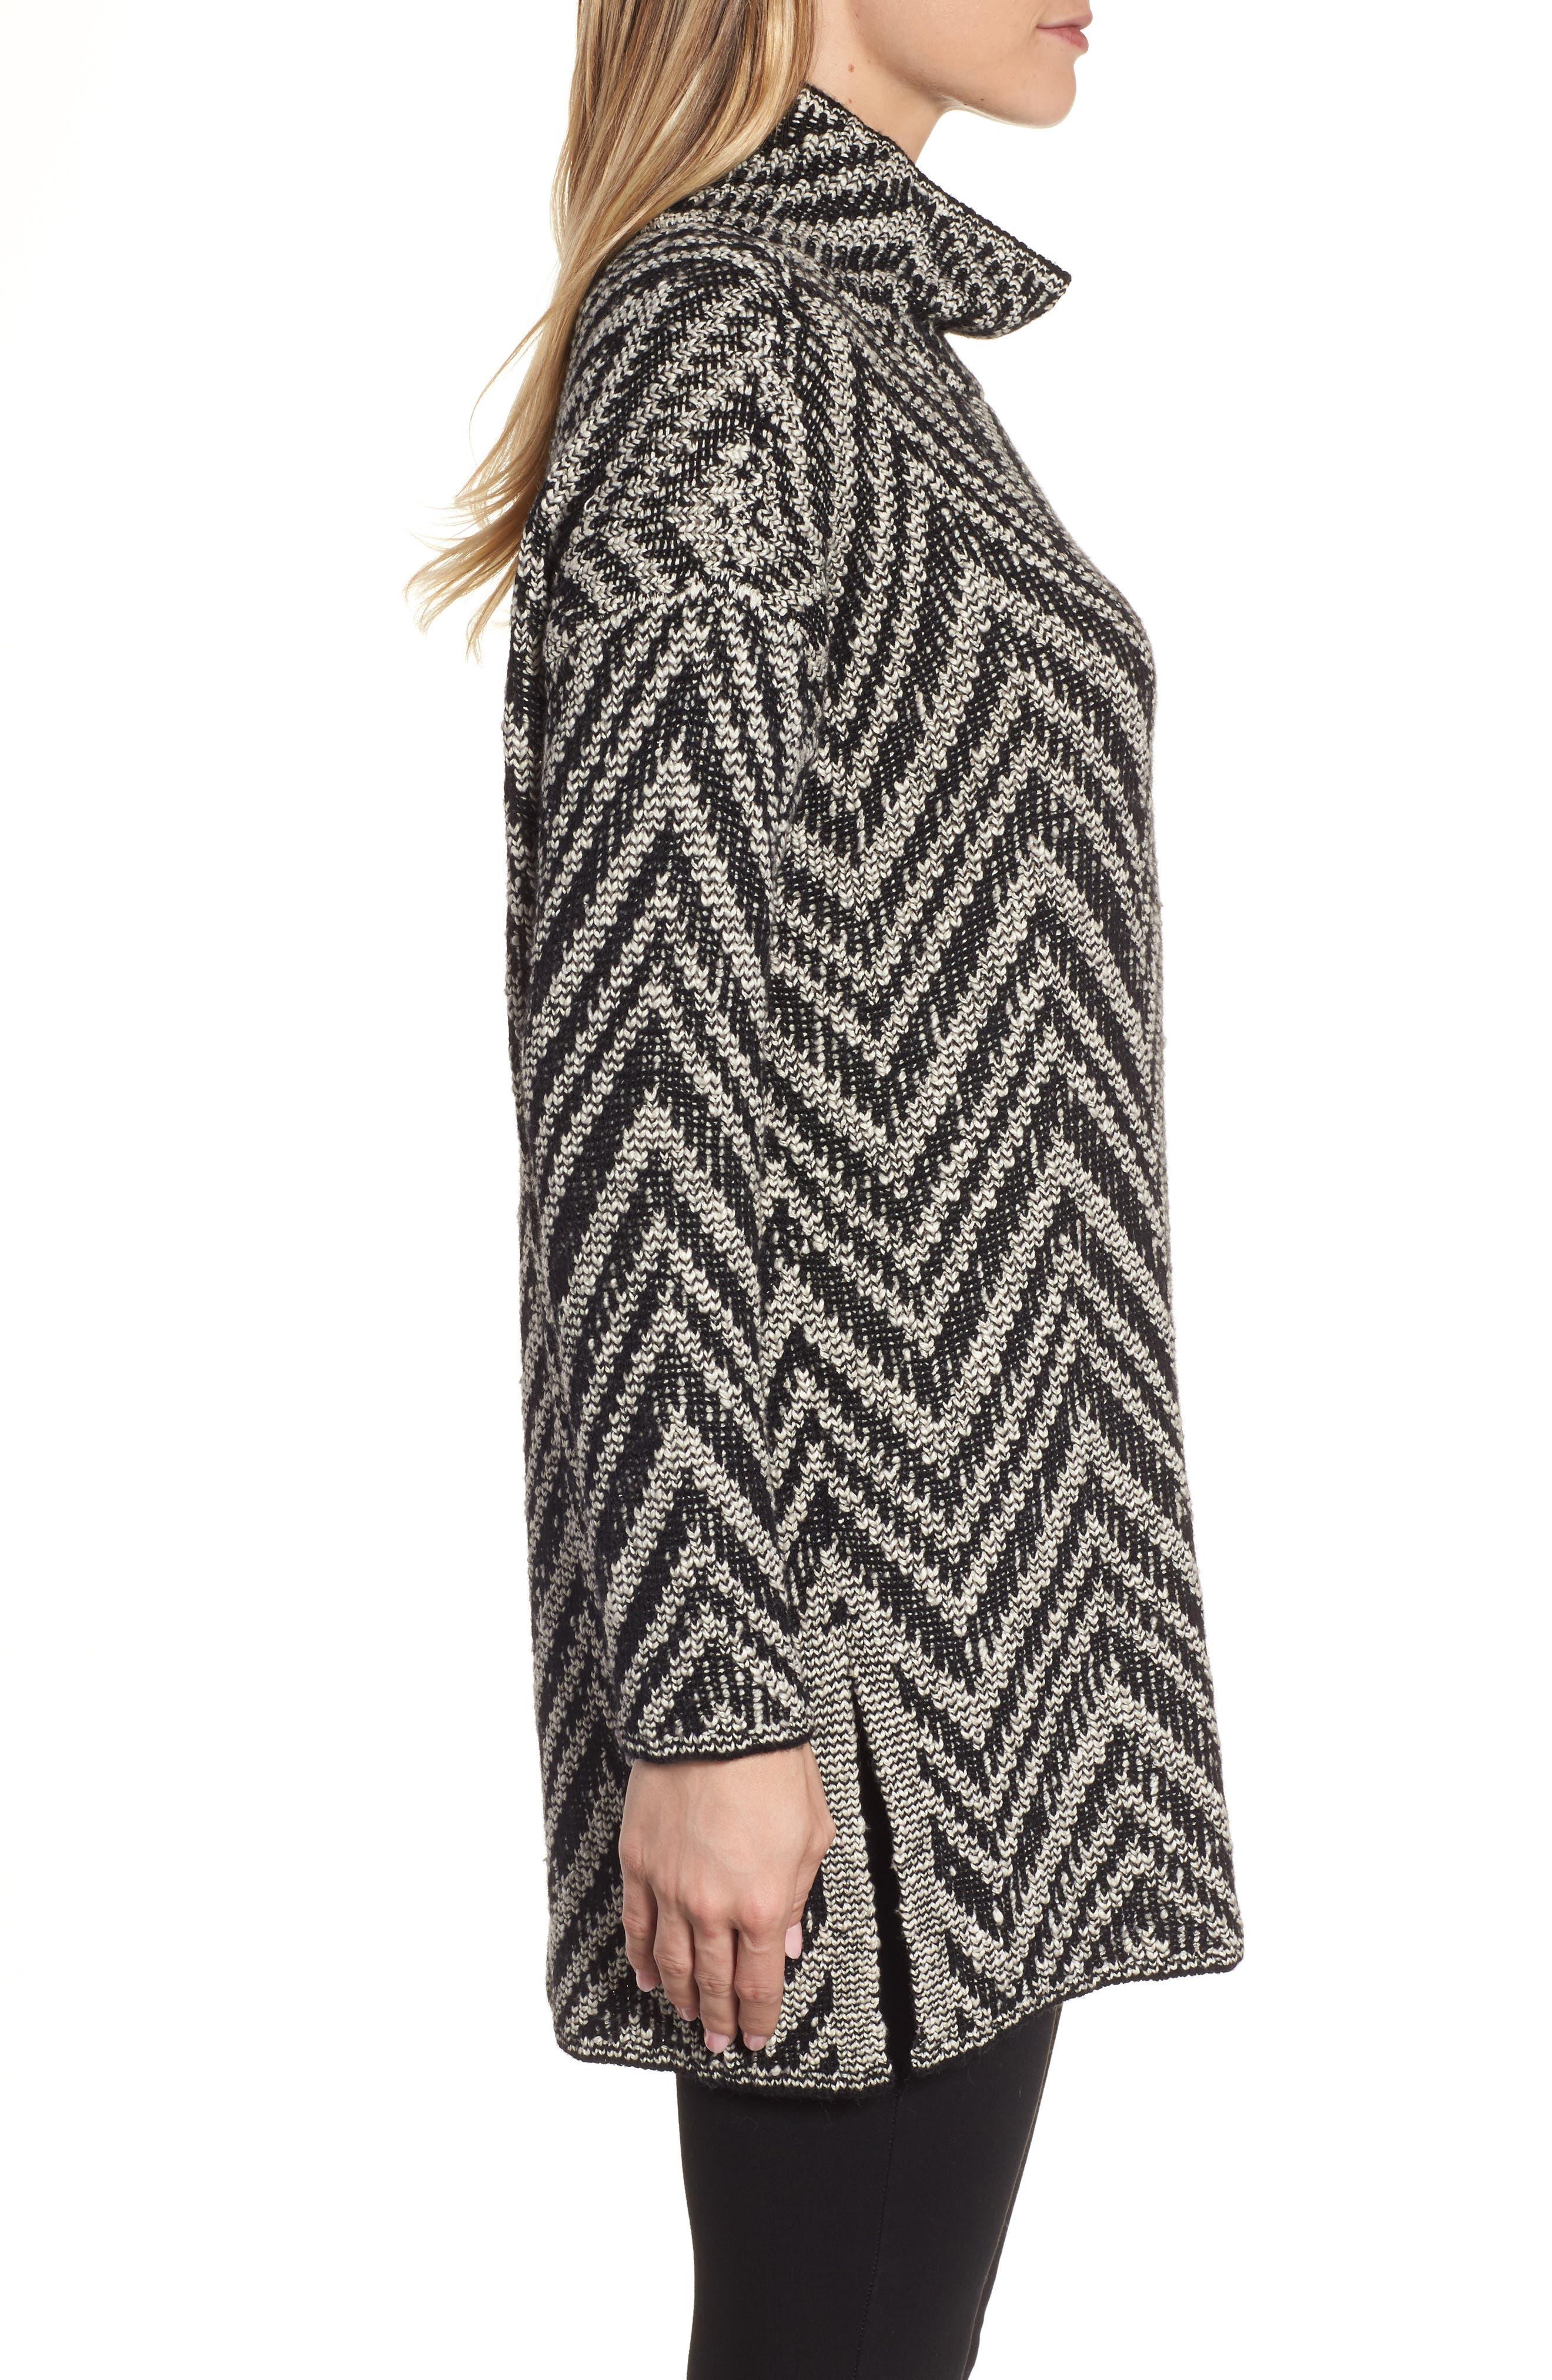 Zigzag Organic Cotton & Alpaca Tunic Sweater,                             Alternate thumbnail 3, color,                             Black/ Soft White